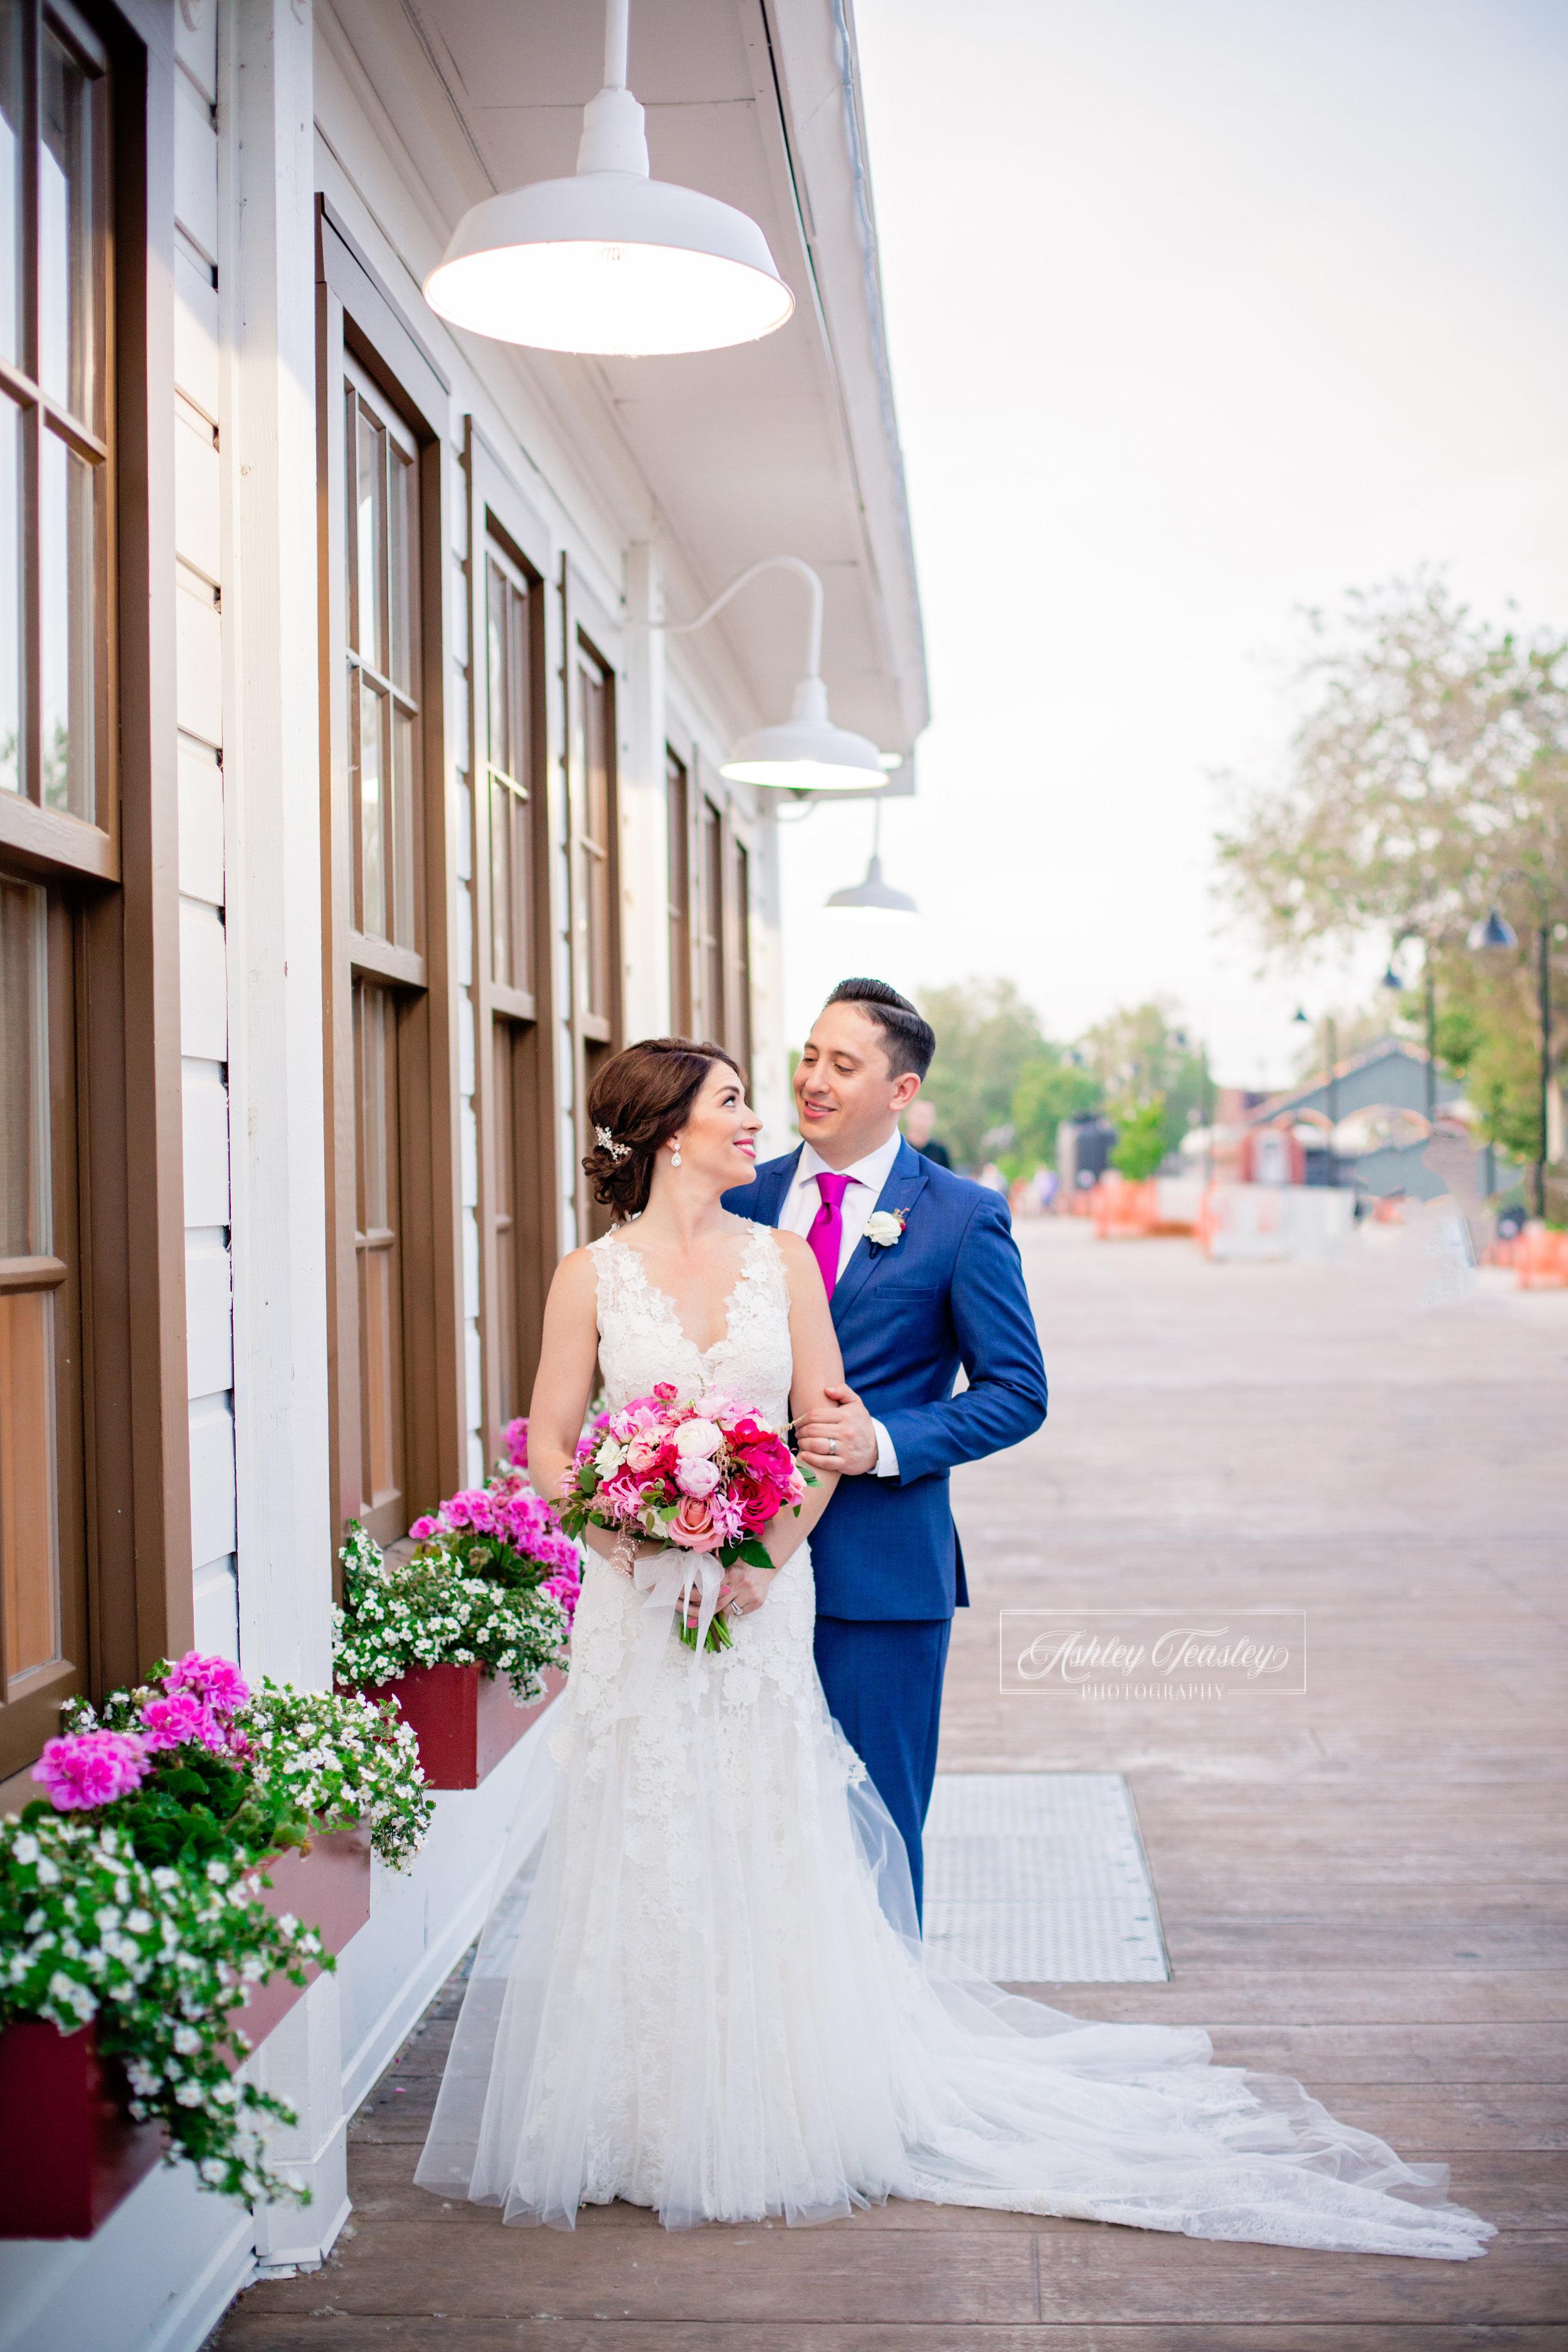 Tarrah & Francisco - The Kimpton Sawyer Hotel - The Firehouse Old Sac - Sacramento Wedding Photographer - Ashley Teasley Photography (69 of 118).jpg